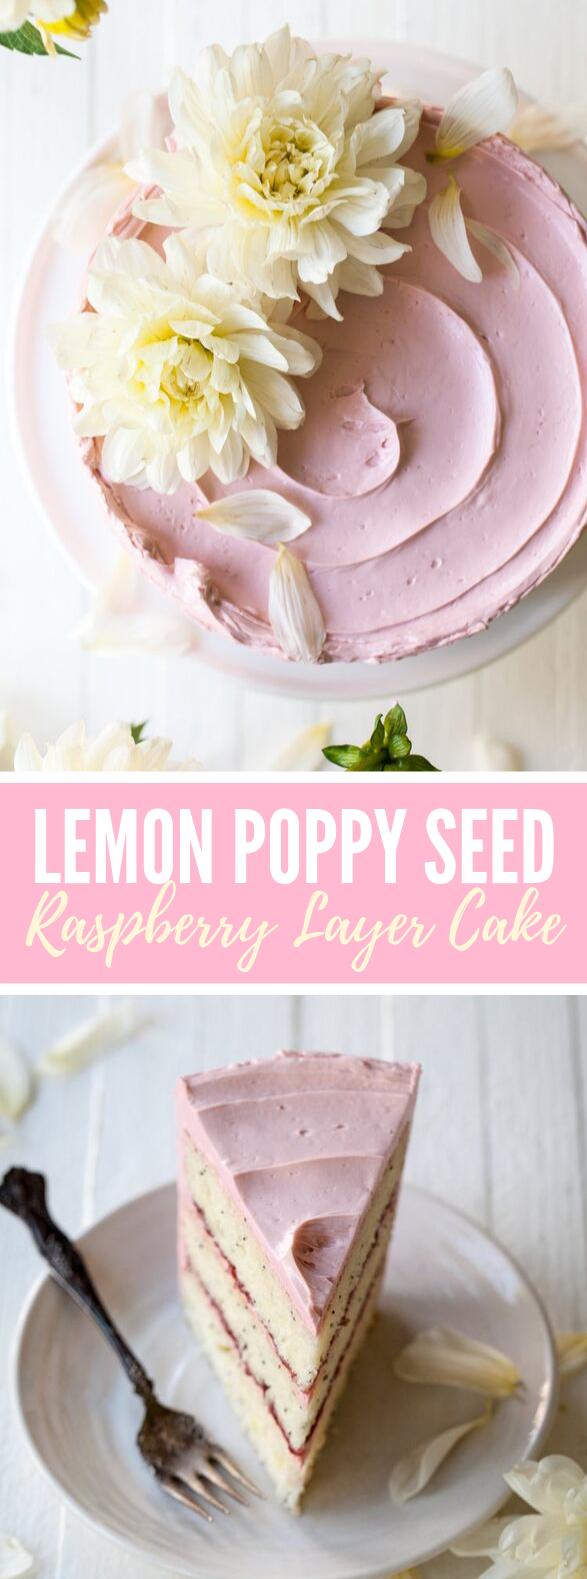 Lemon Poppy Seed Raspberry Layer Cake #desserts #frosting